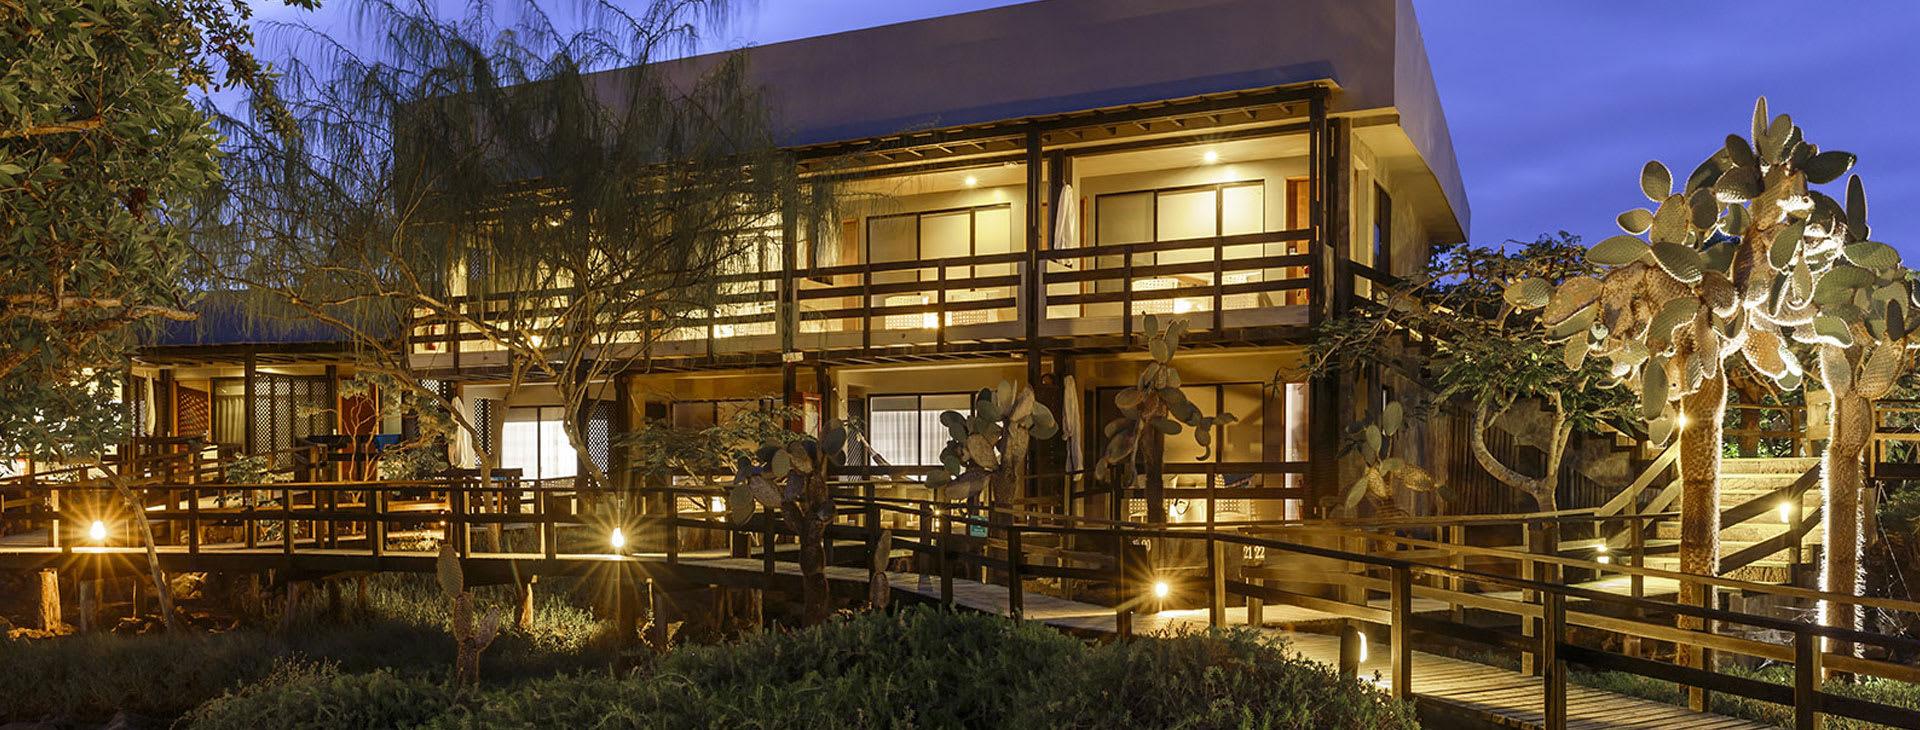 Lodge at dusk